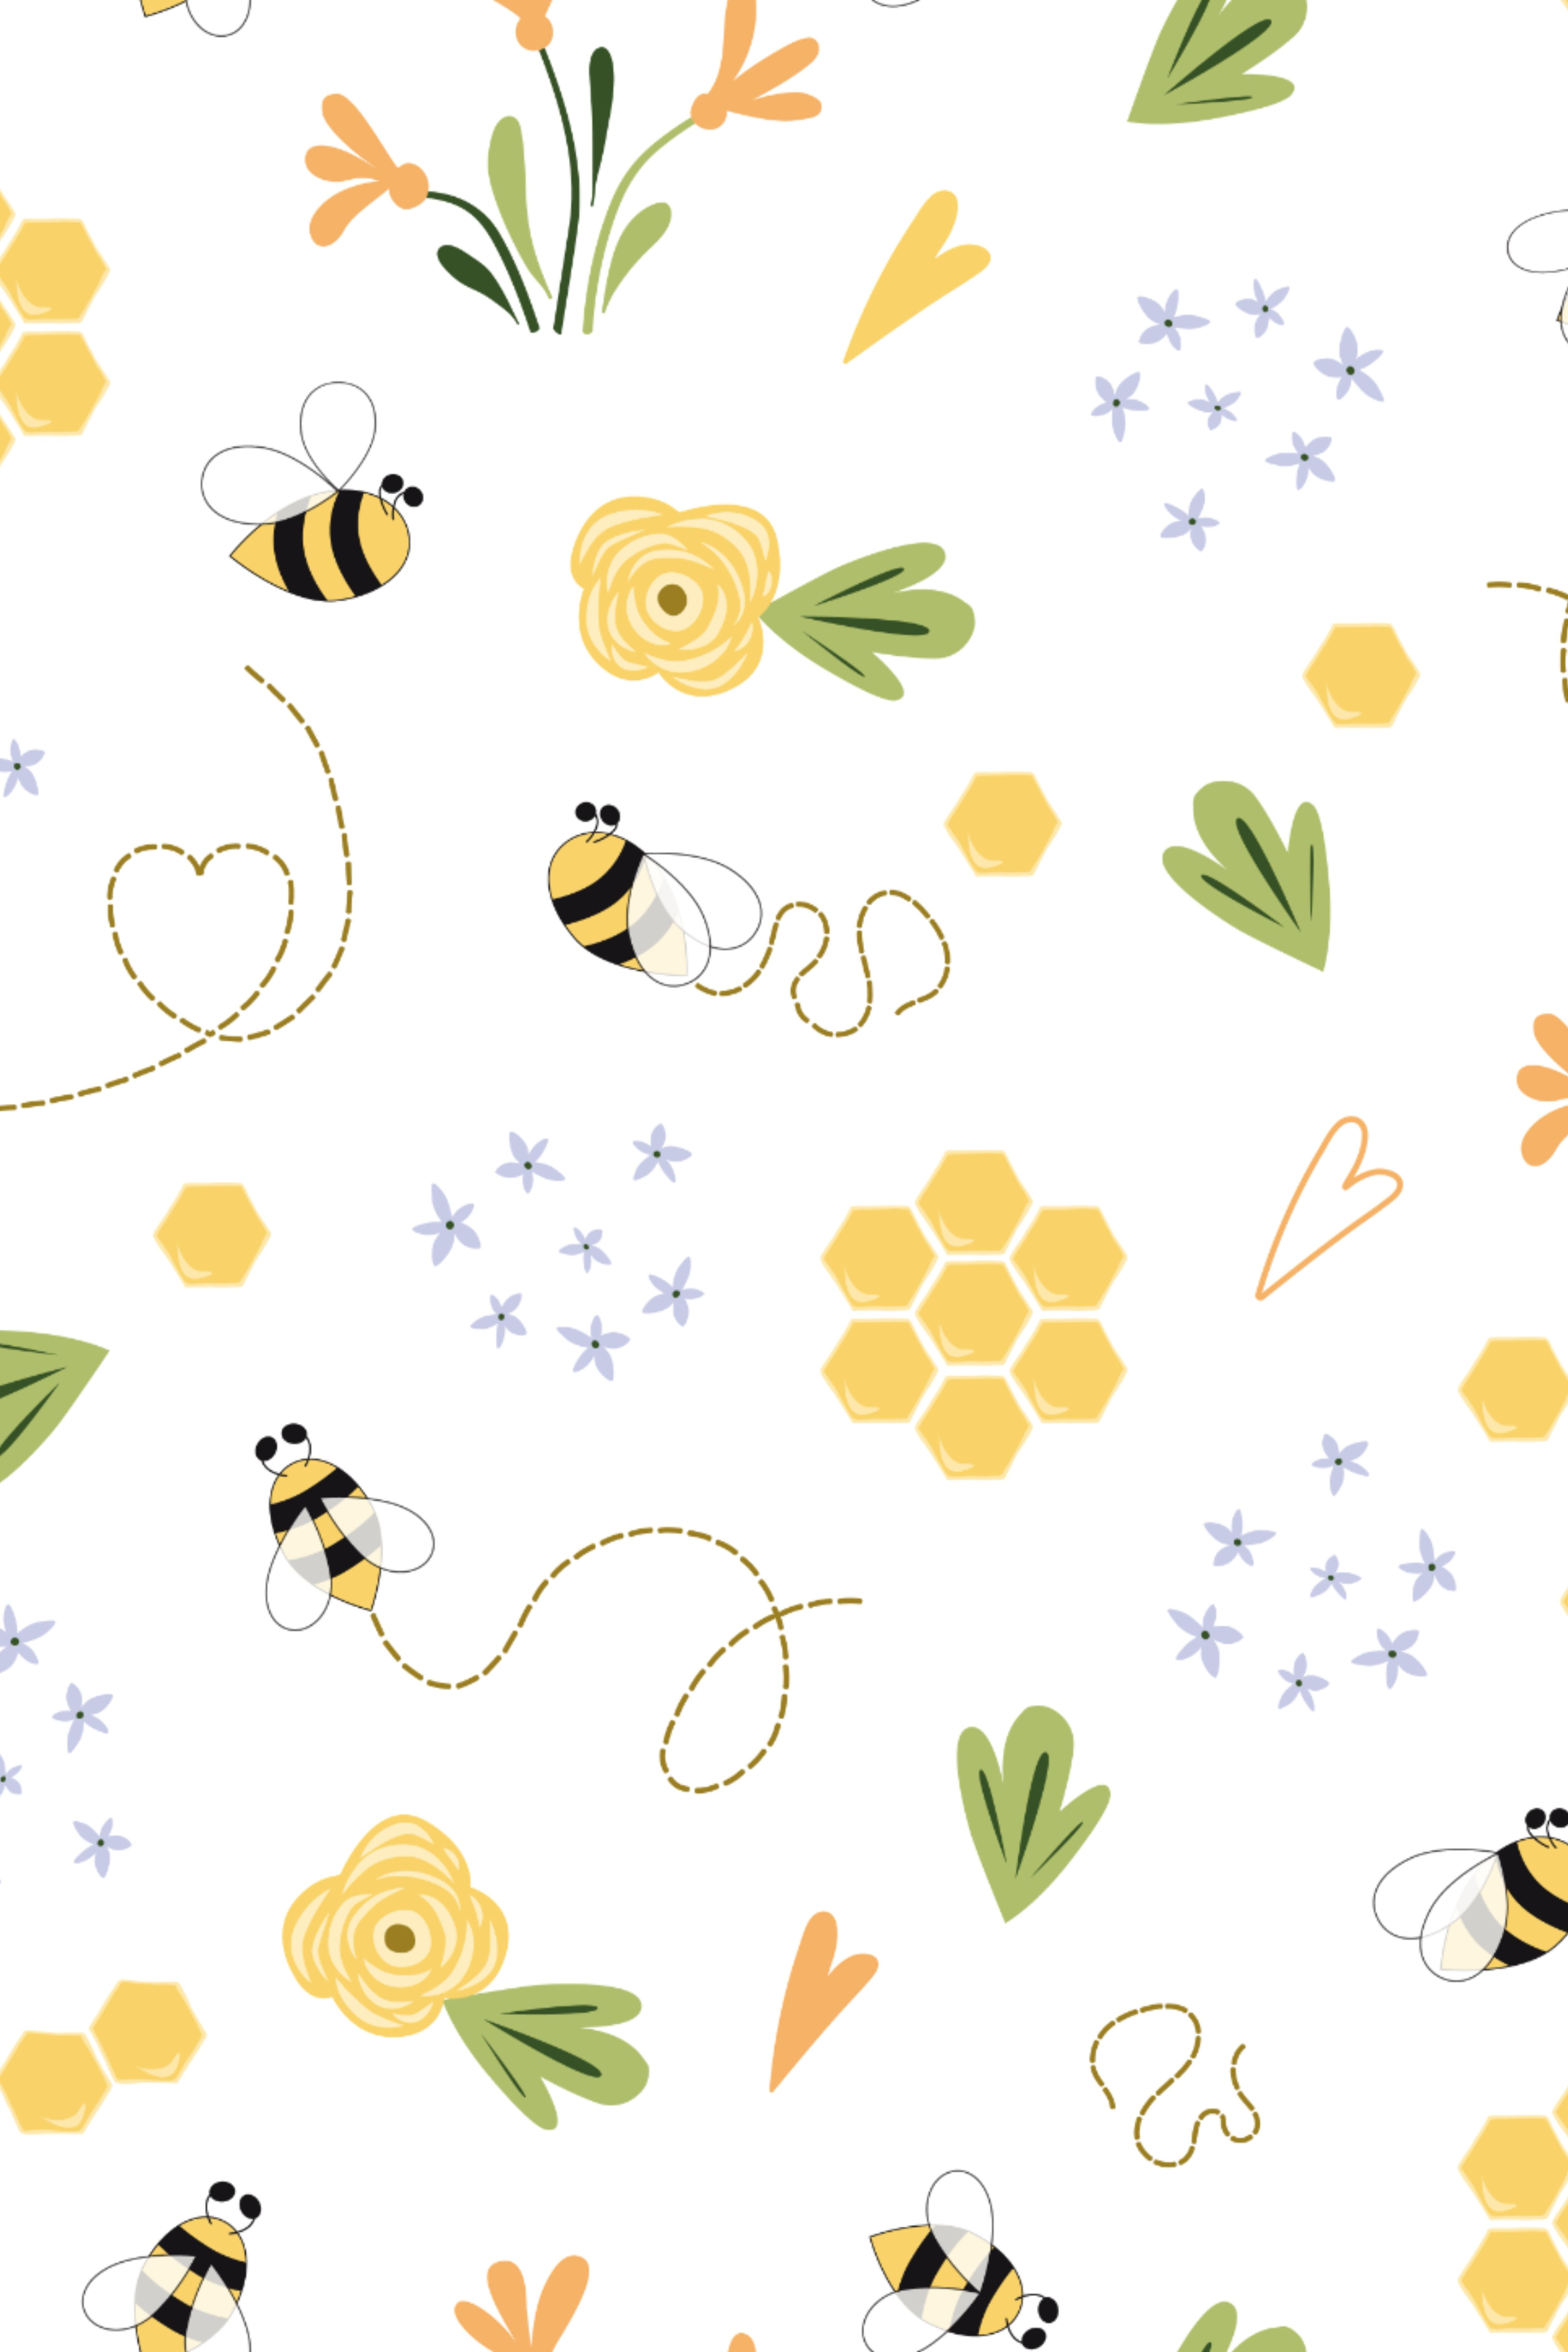 10 Honey Bee Patterns Cute Bee Pretty Wallpapers Iphone Background Wallpaper Pattern Wallpaper